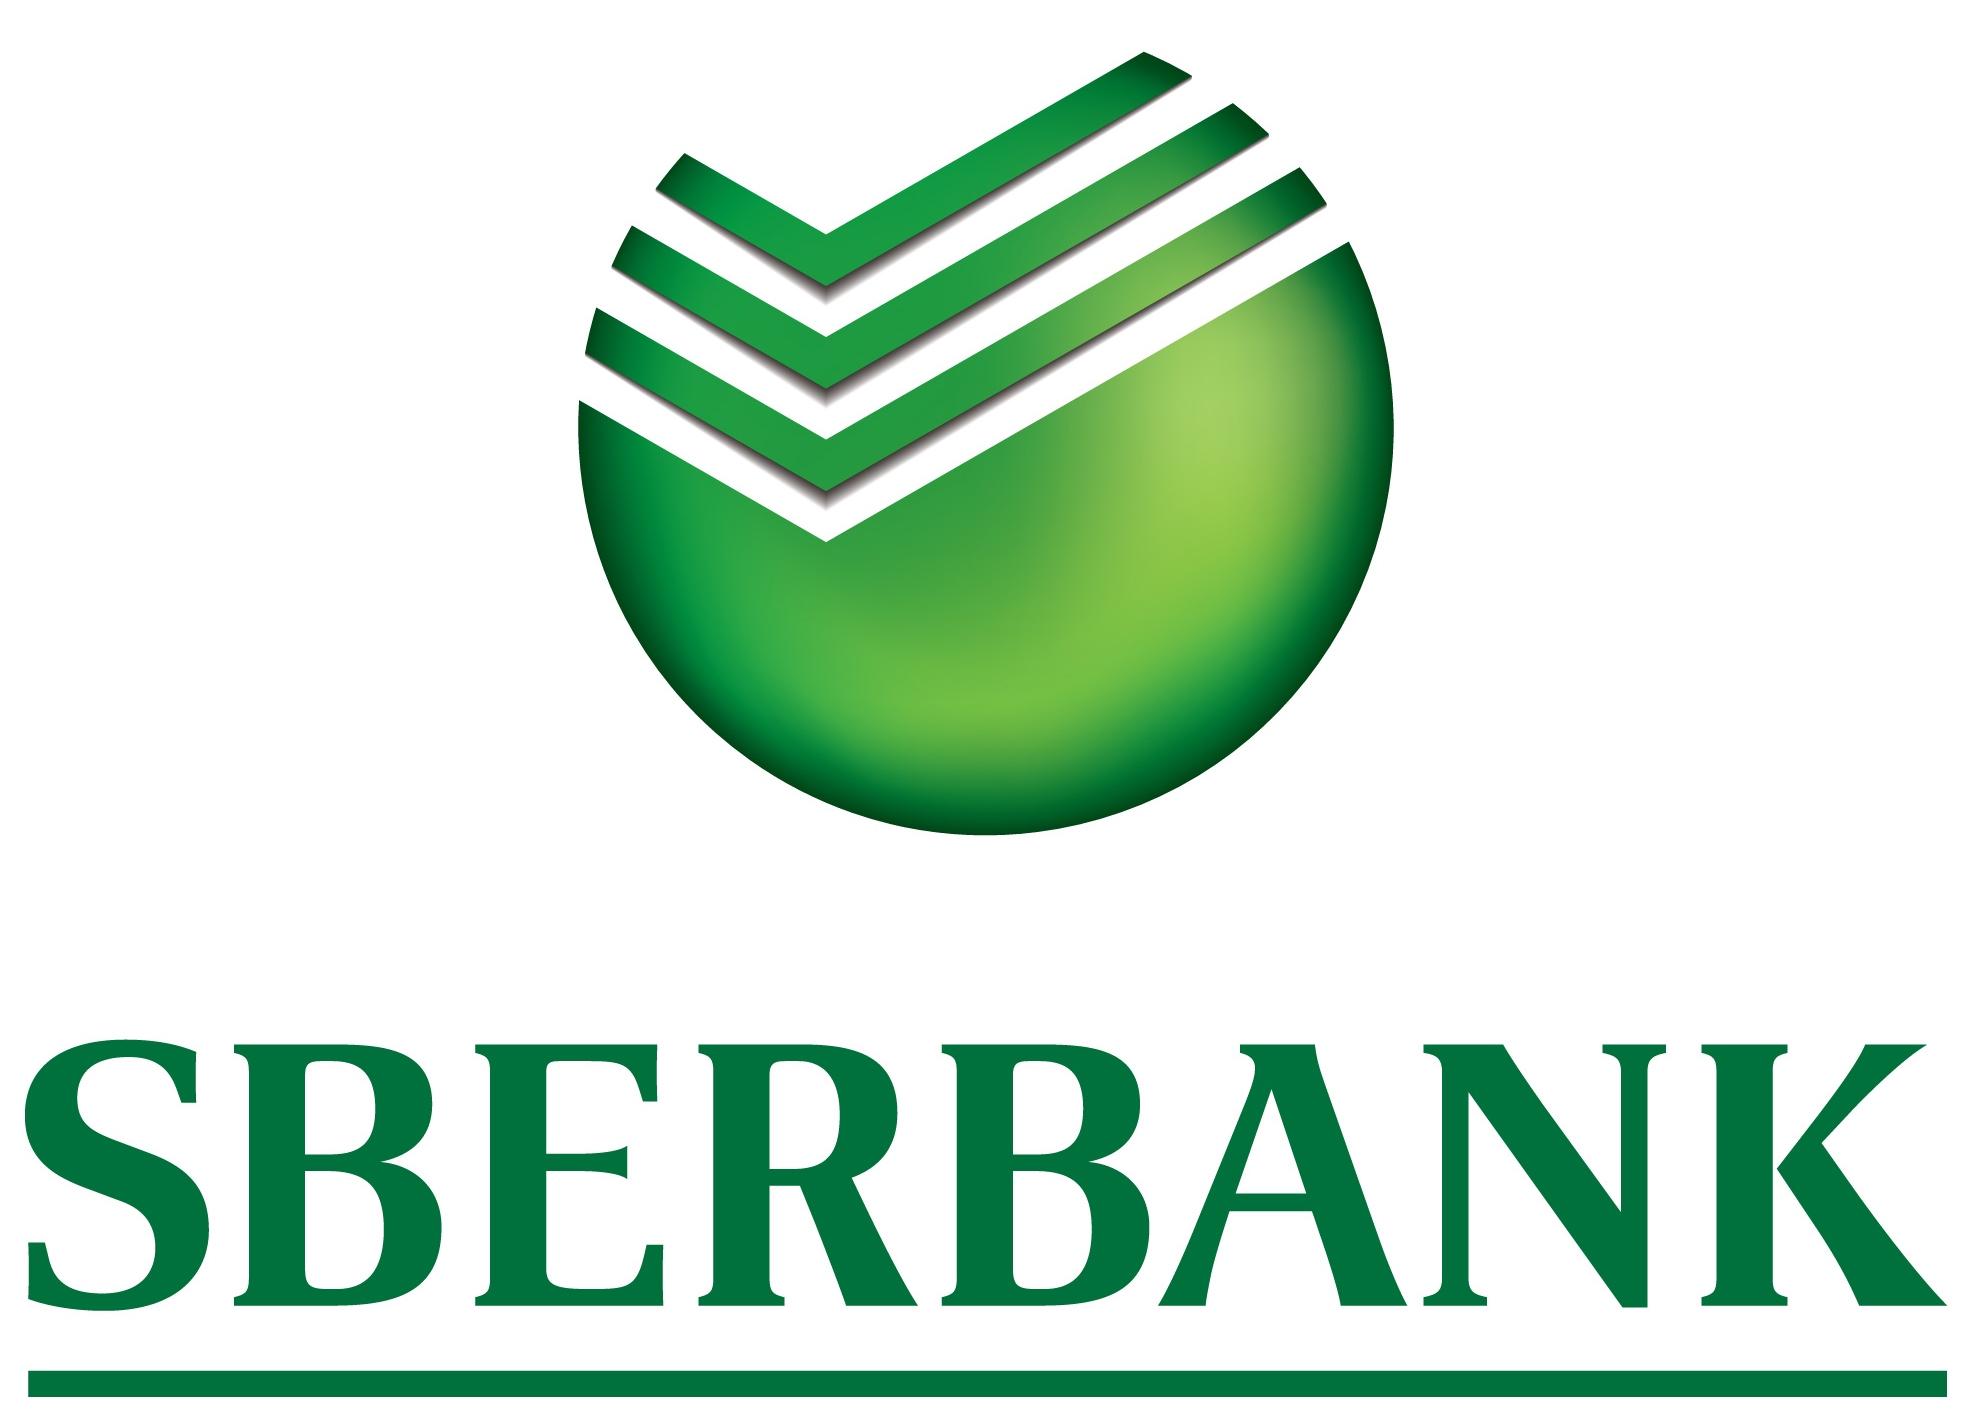 Sber-banka